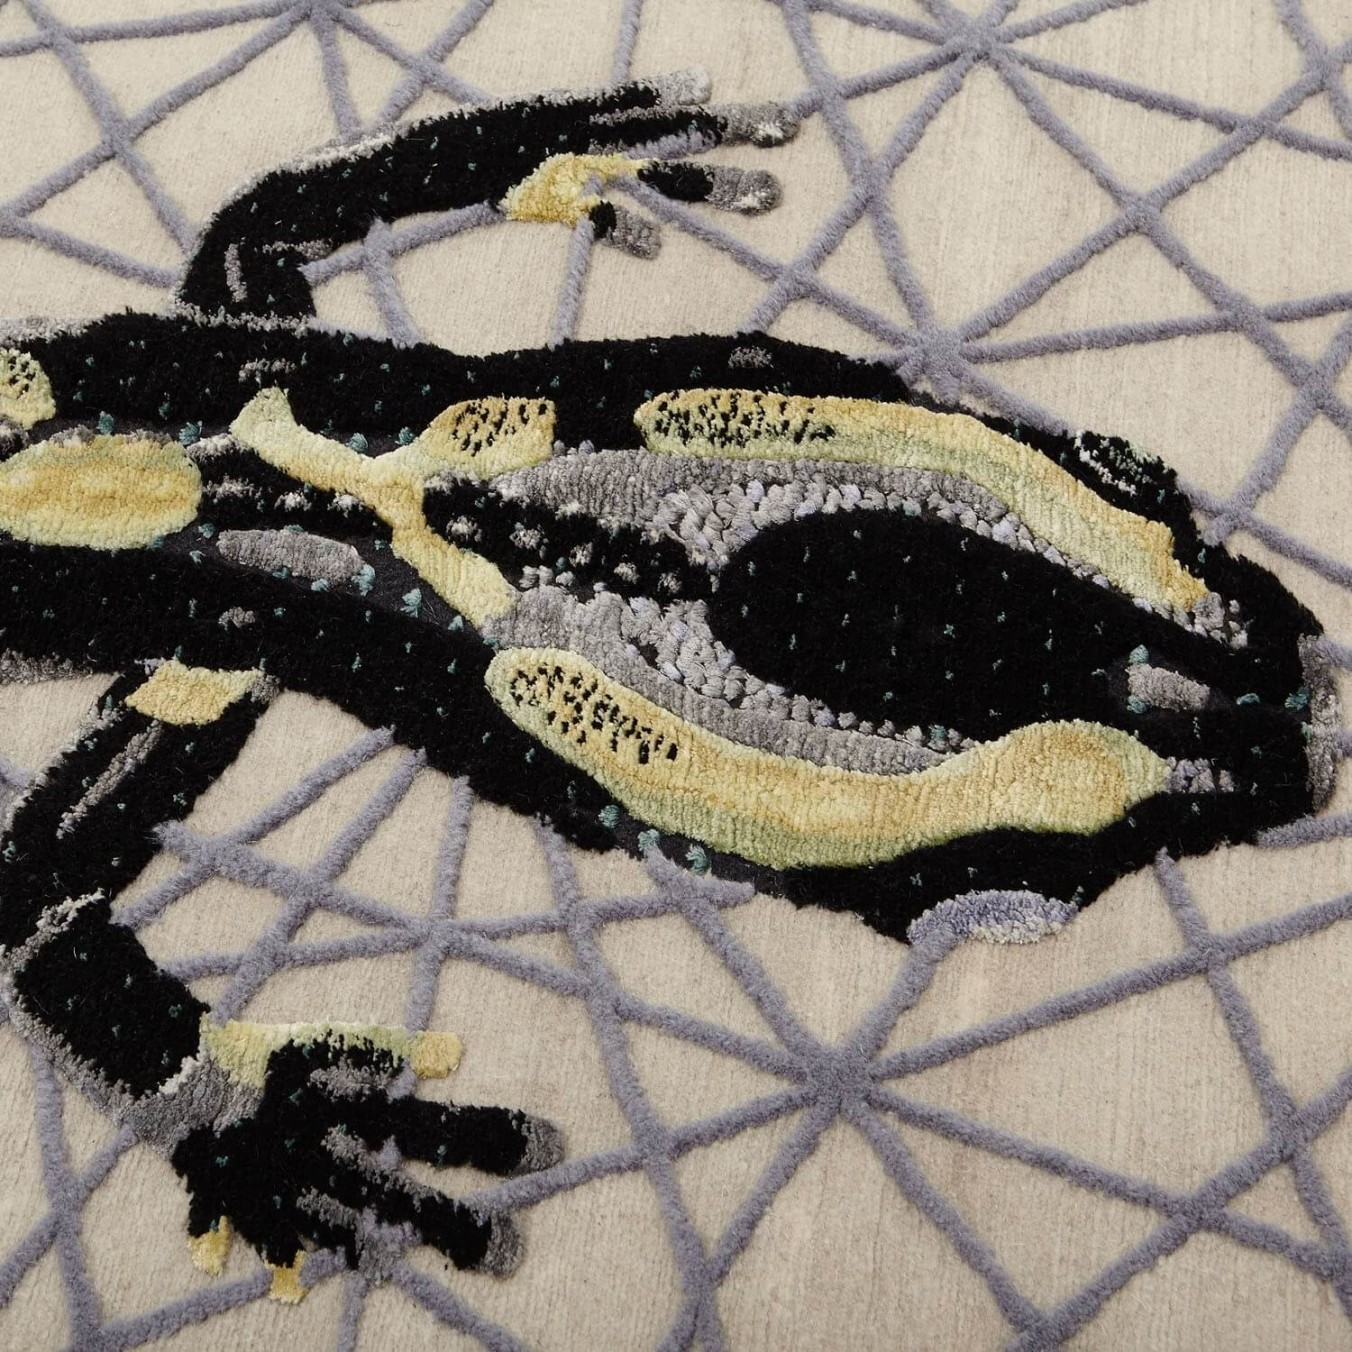 Salamandra Ardentis Agri